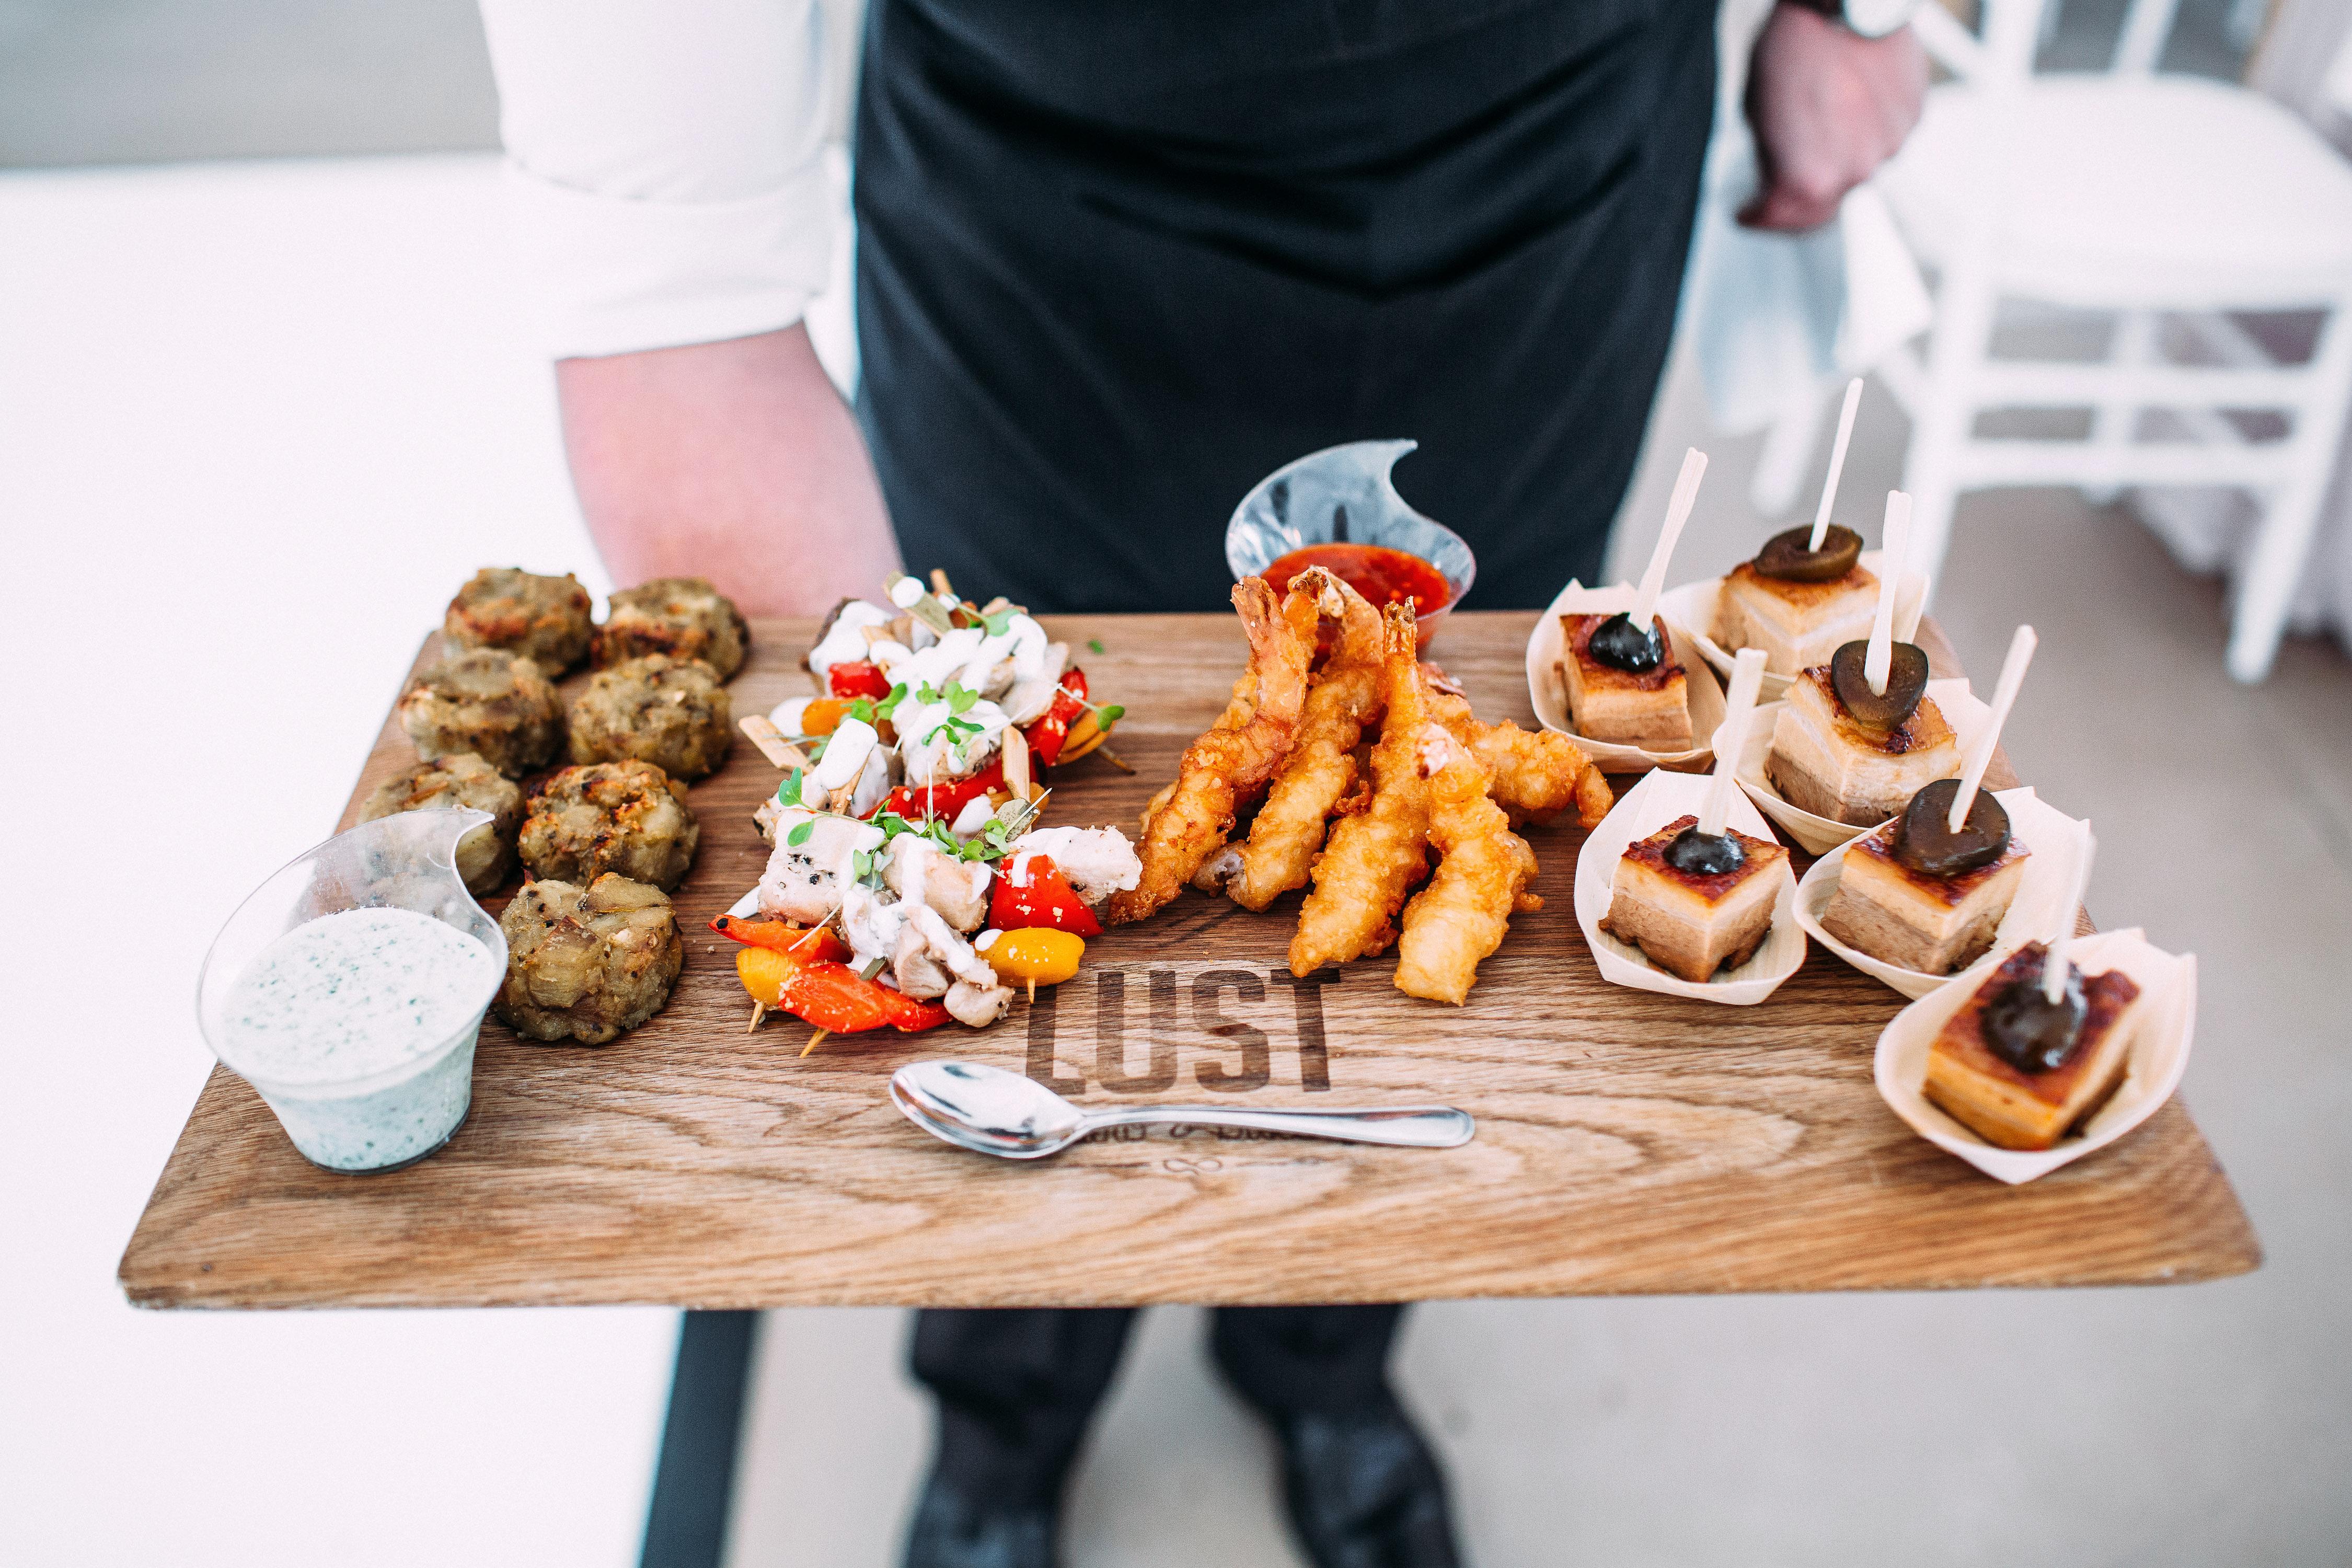 yolana douglas wedding reception food on platter